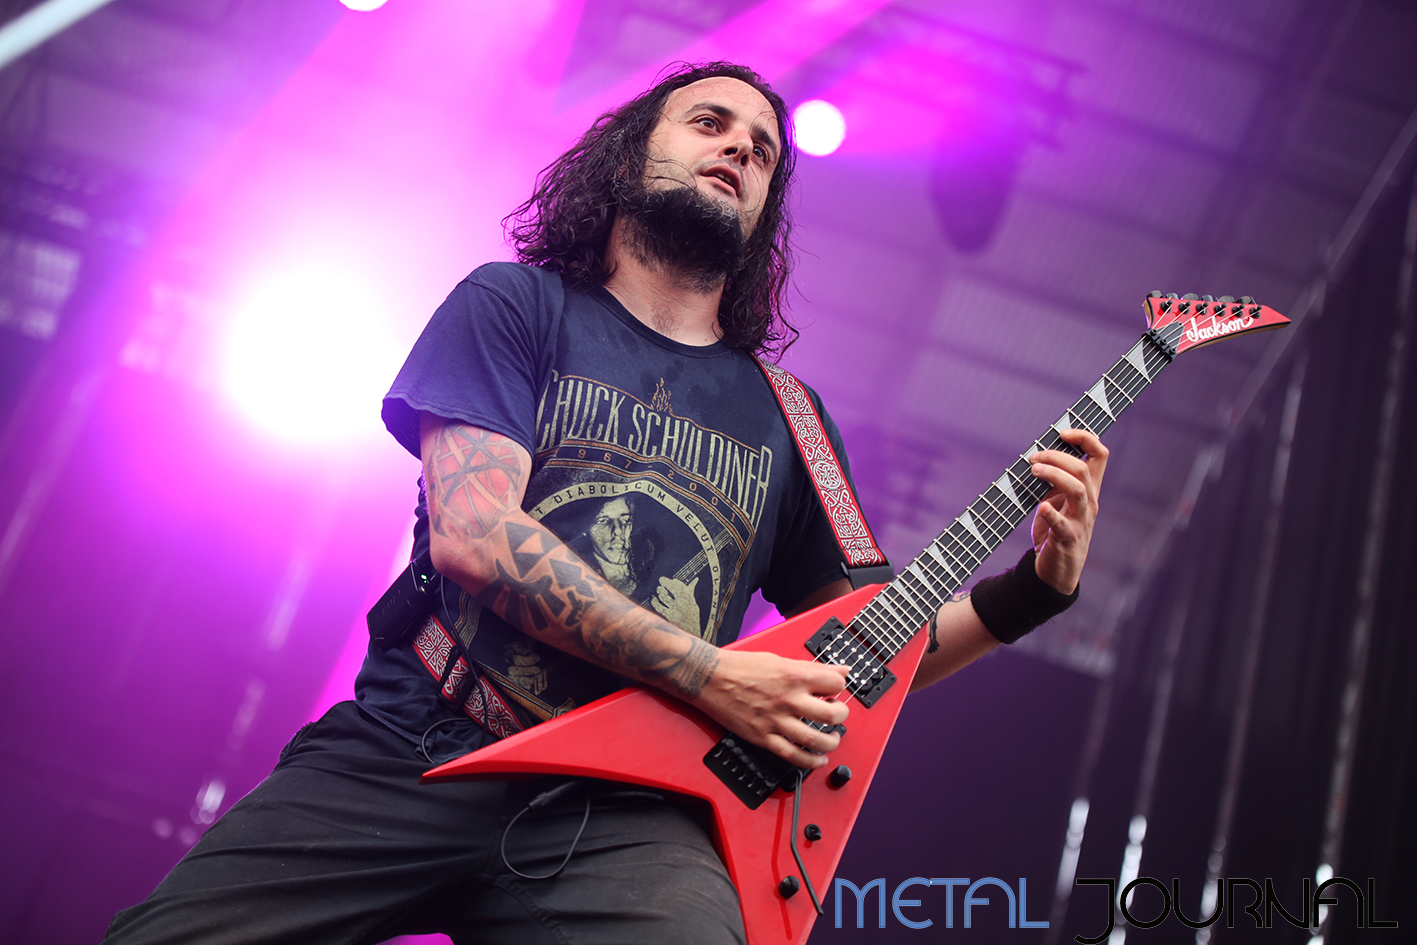 angelus apatrida - metal journal rock fest barcelona 2019 pic 2